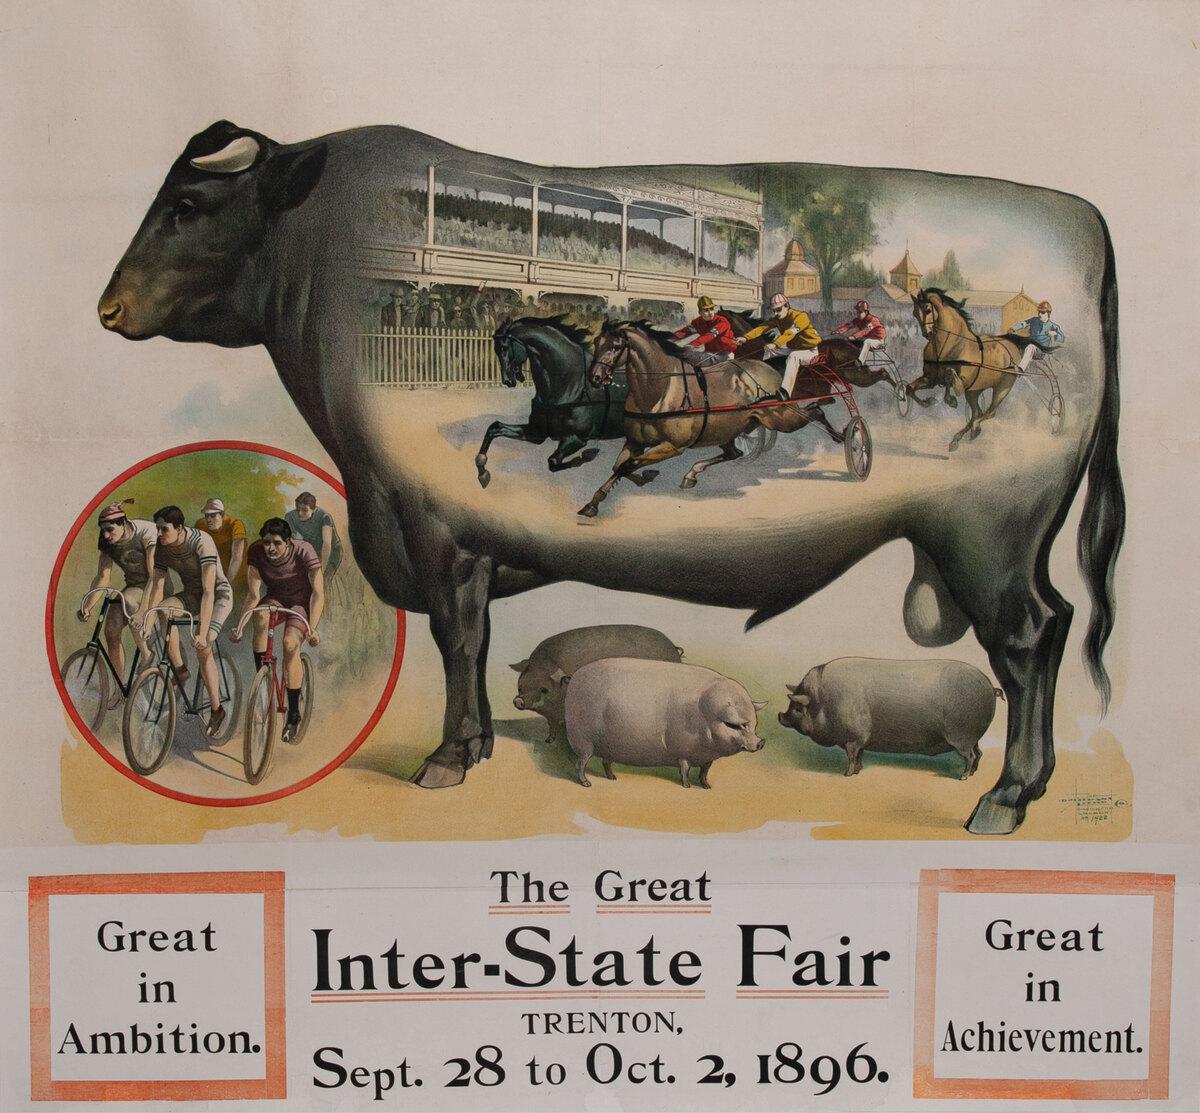 The Great Inter-State Fair Trenton